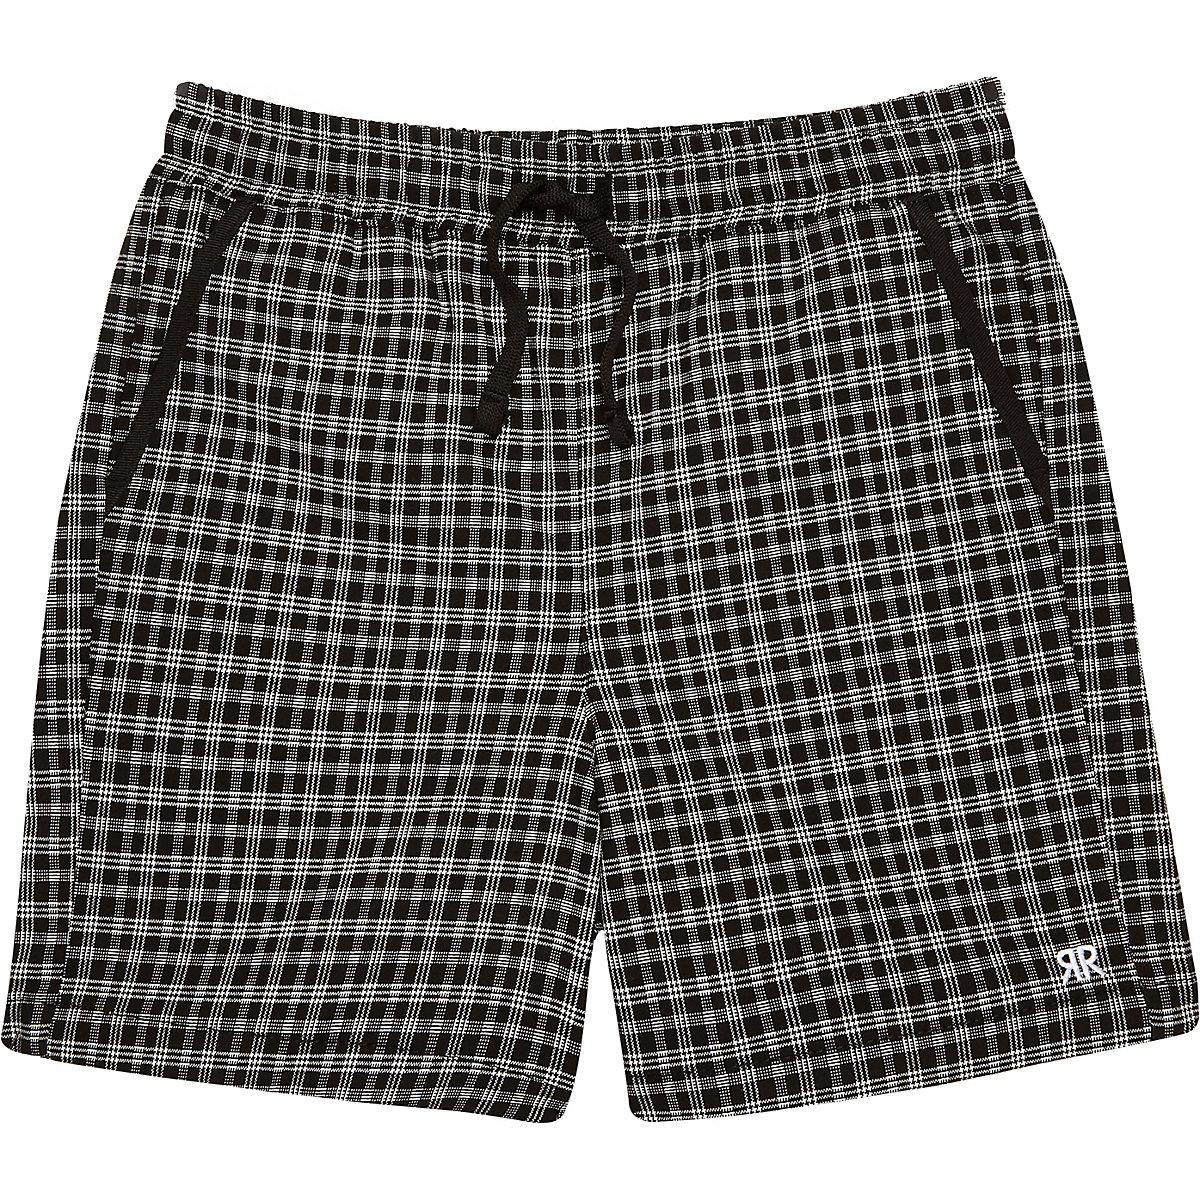 Boys black check shorts